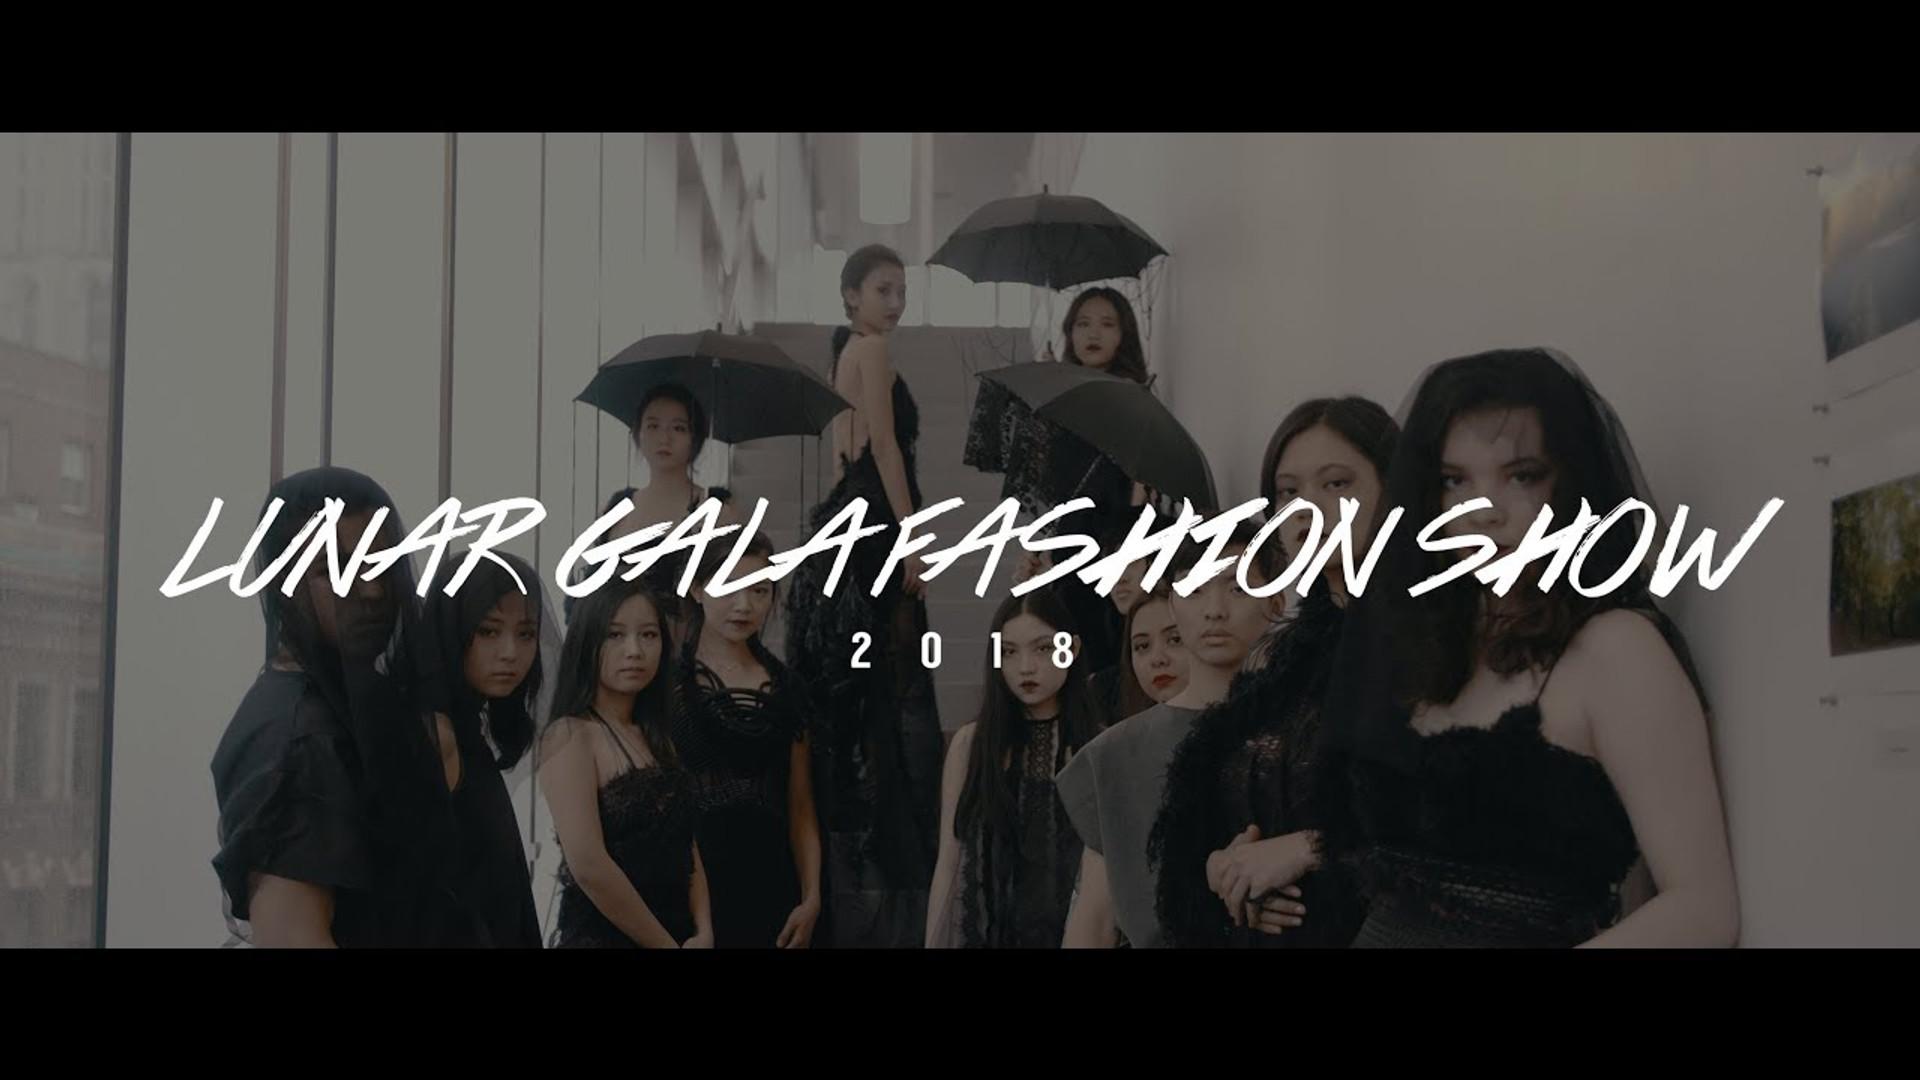 Lunar Gala Fashion Show 2018 | PRISM